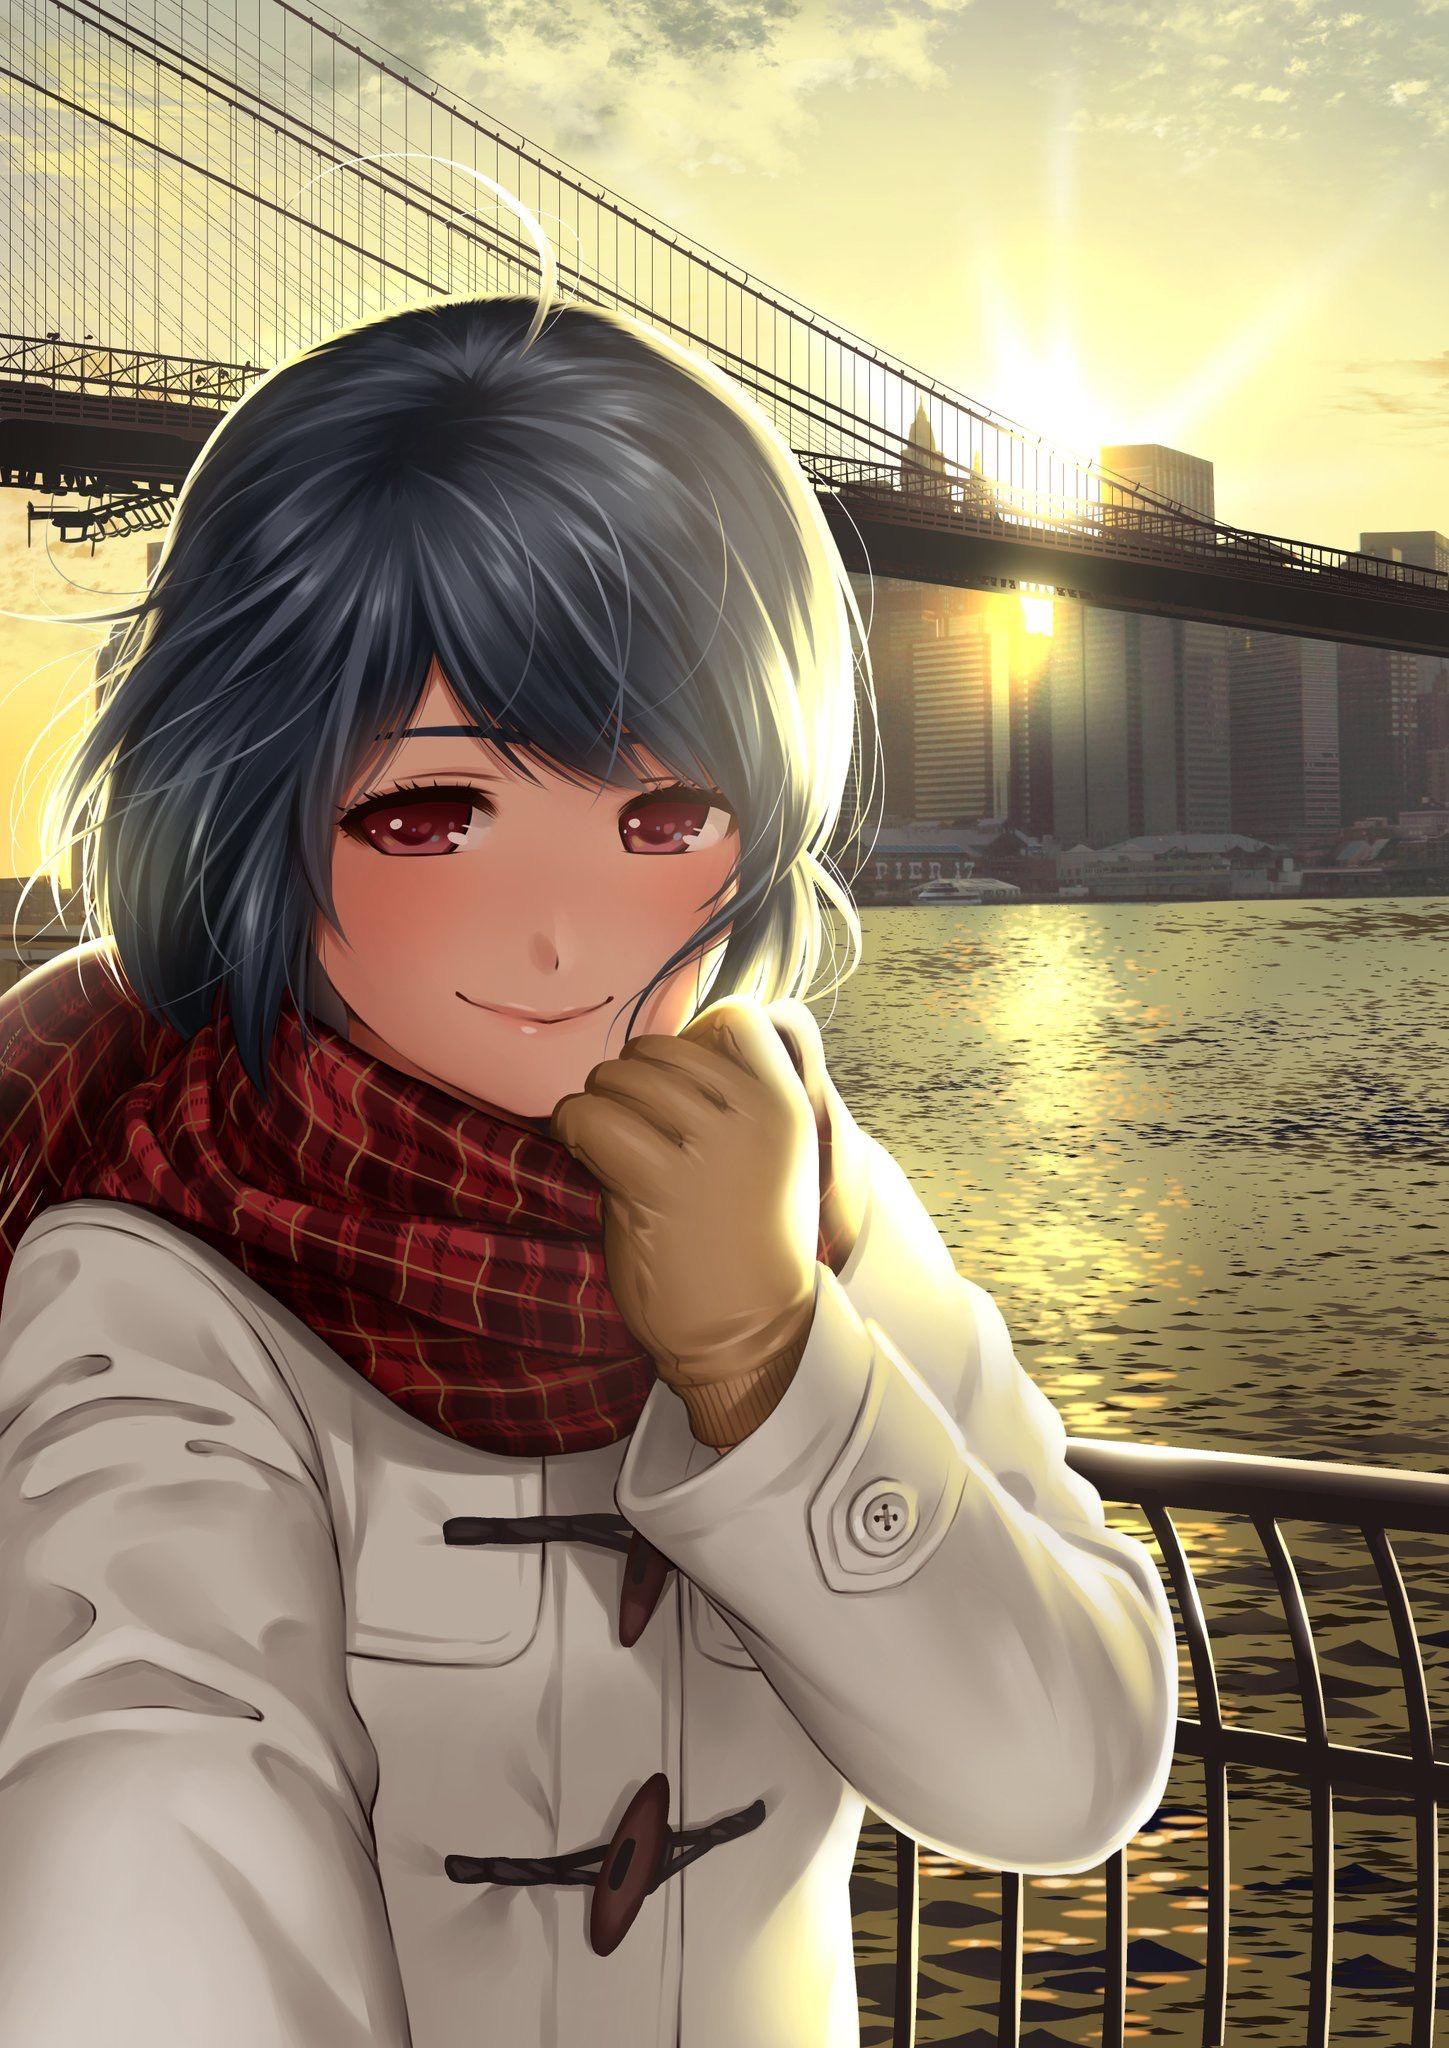 Tachibana Rui Arte de anime, Anime mujer, Wallpaper de anime